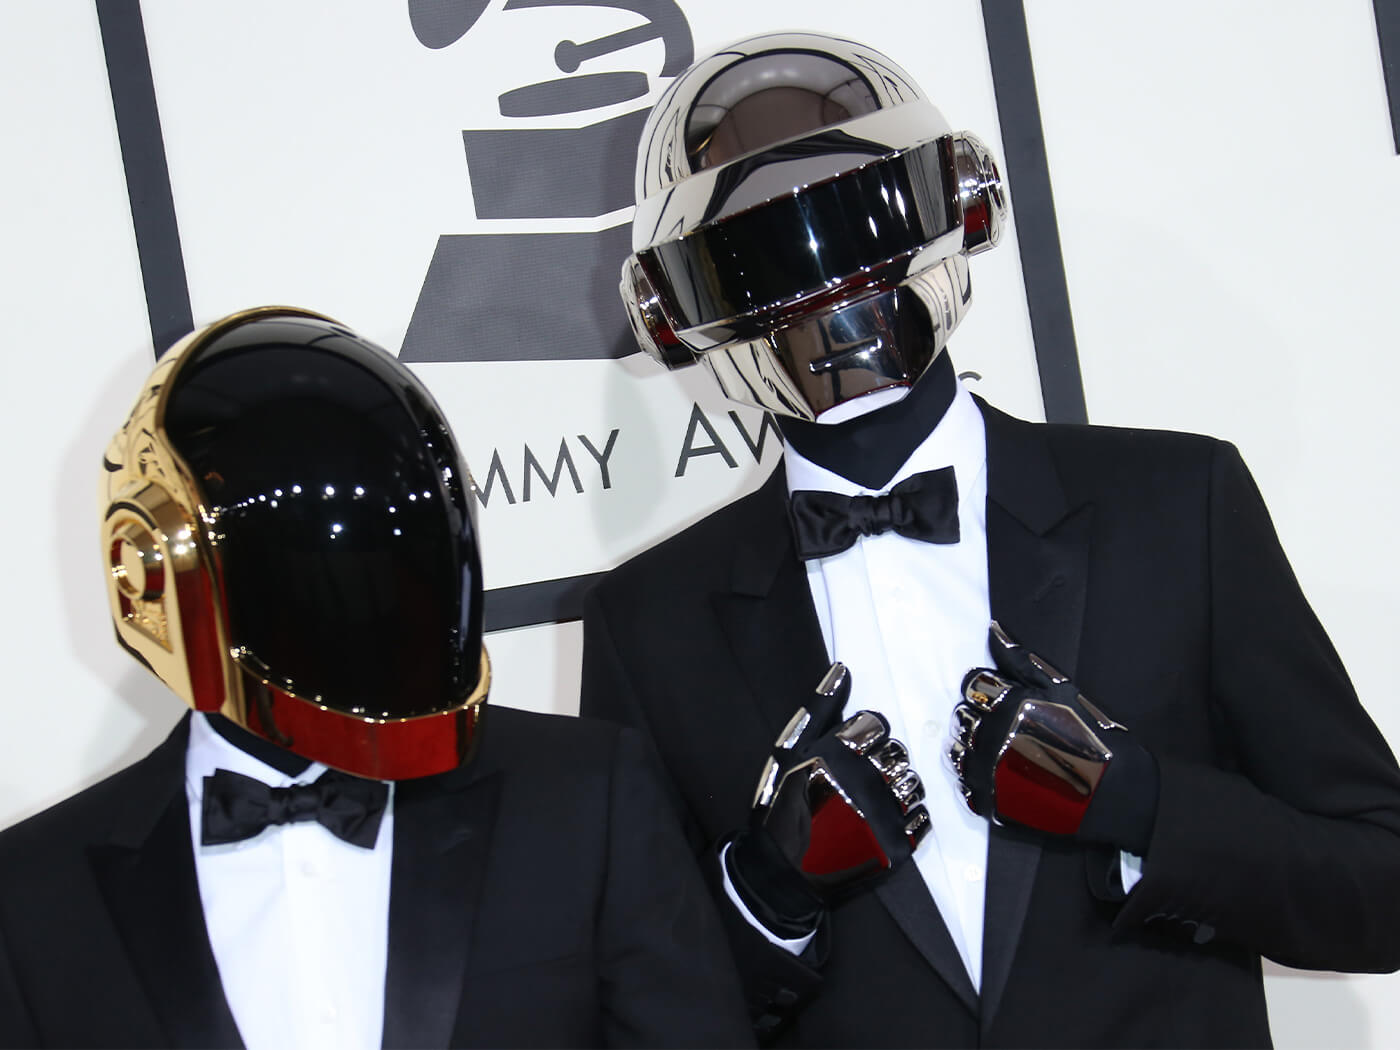 Daft Punk Tux